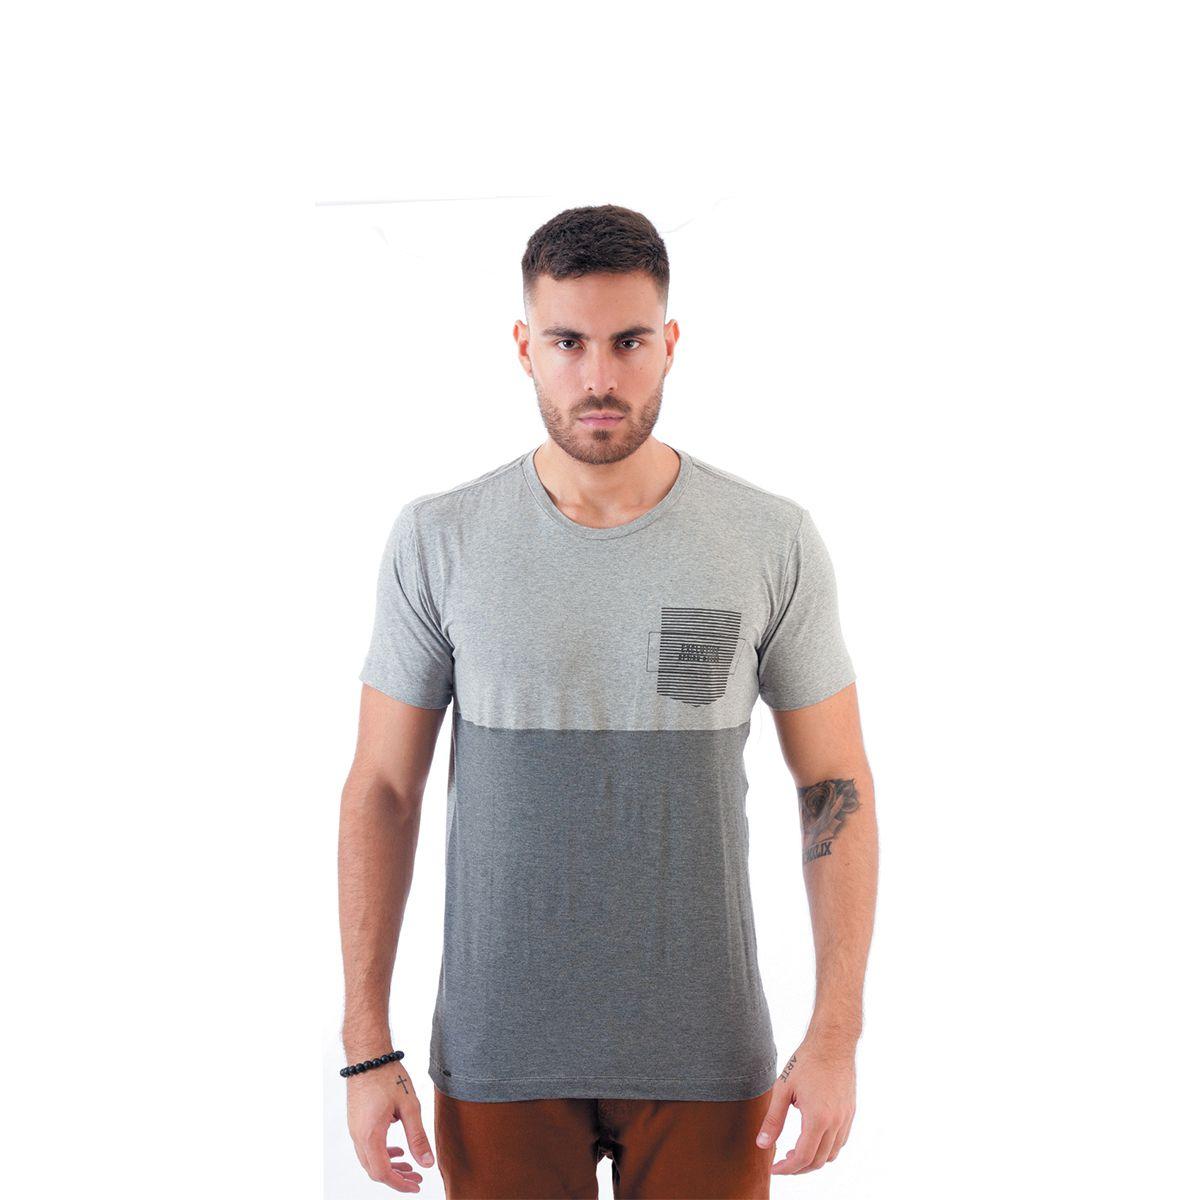 Camiseta Masculina Dixie 11.24.0833